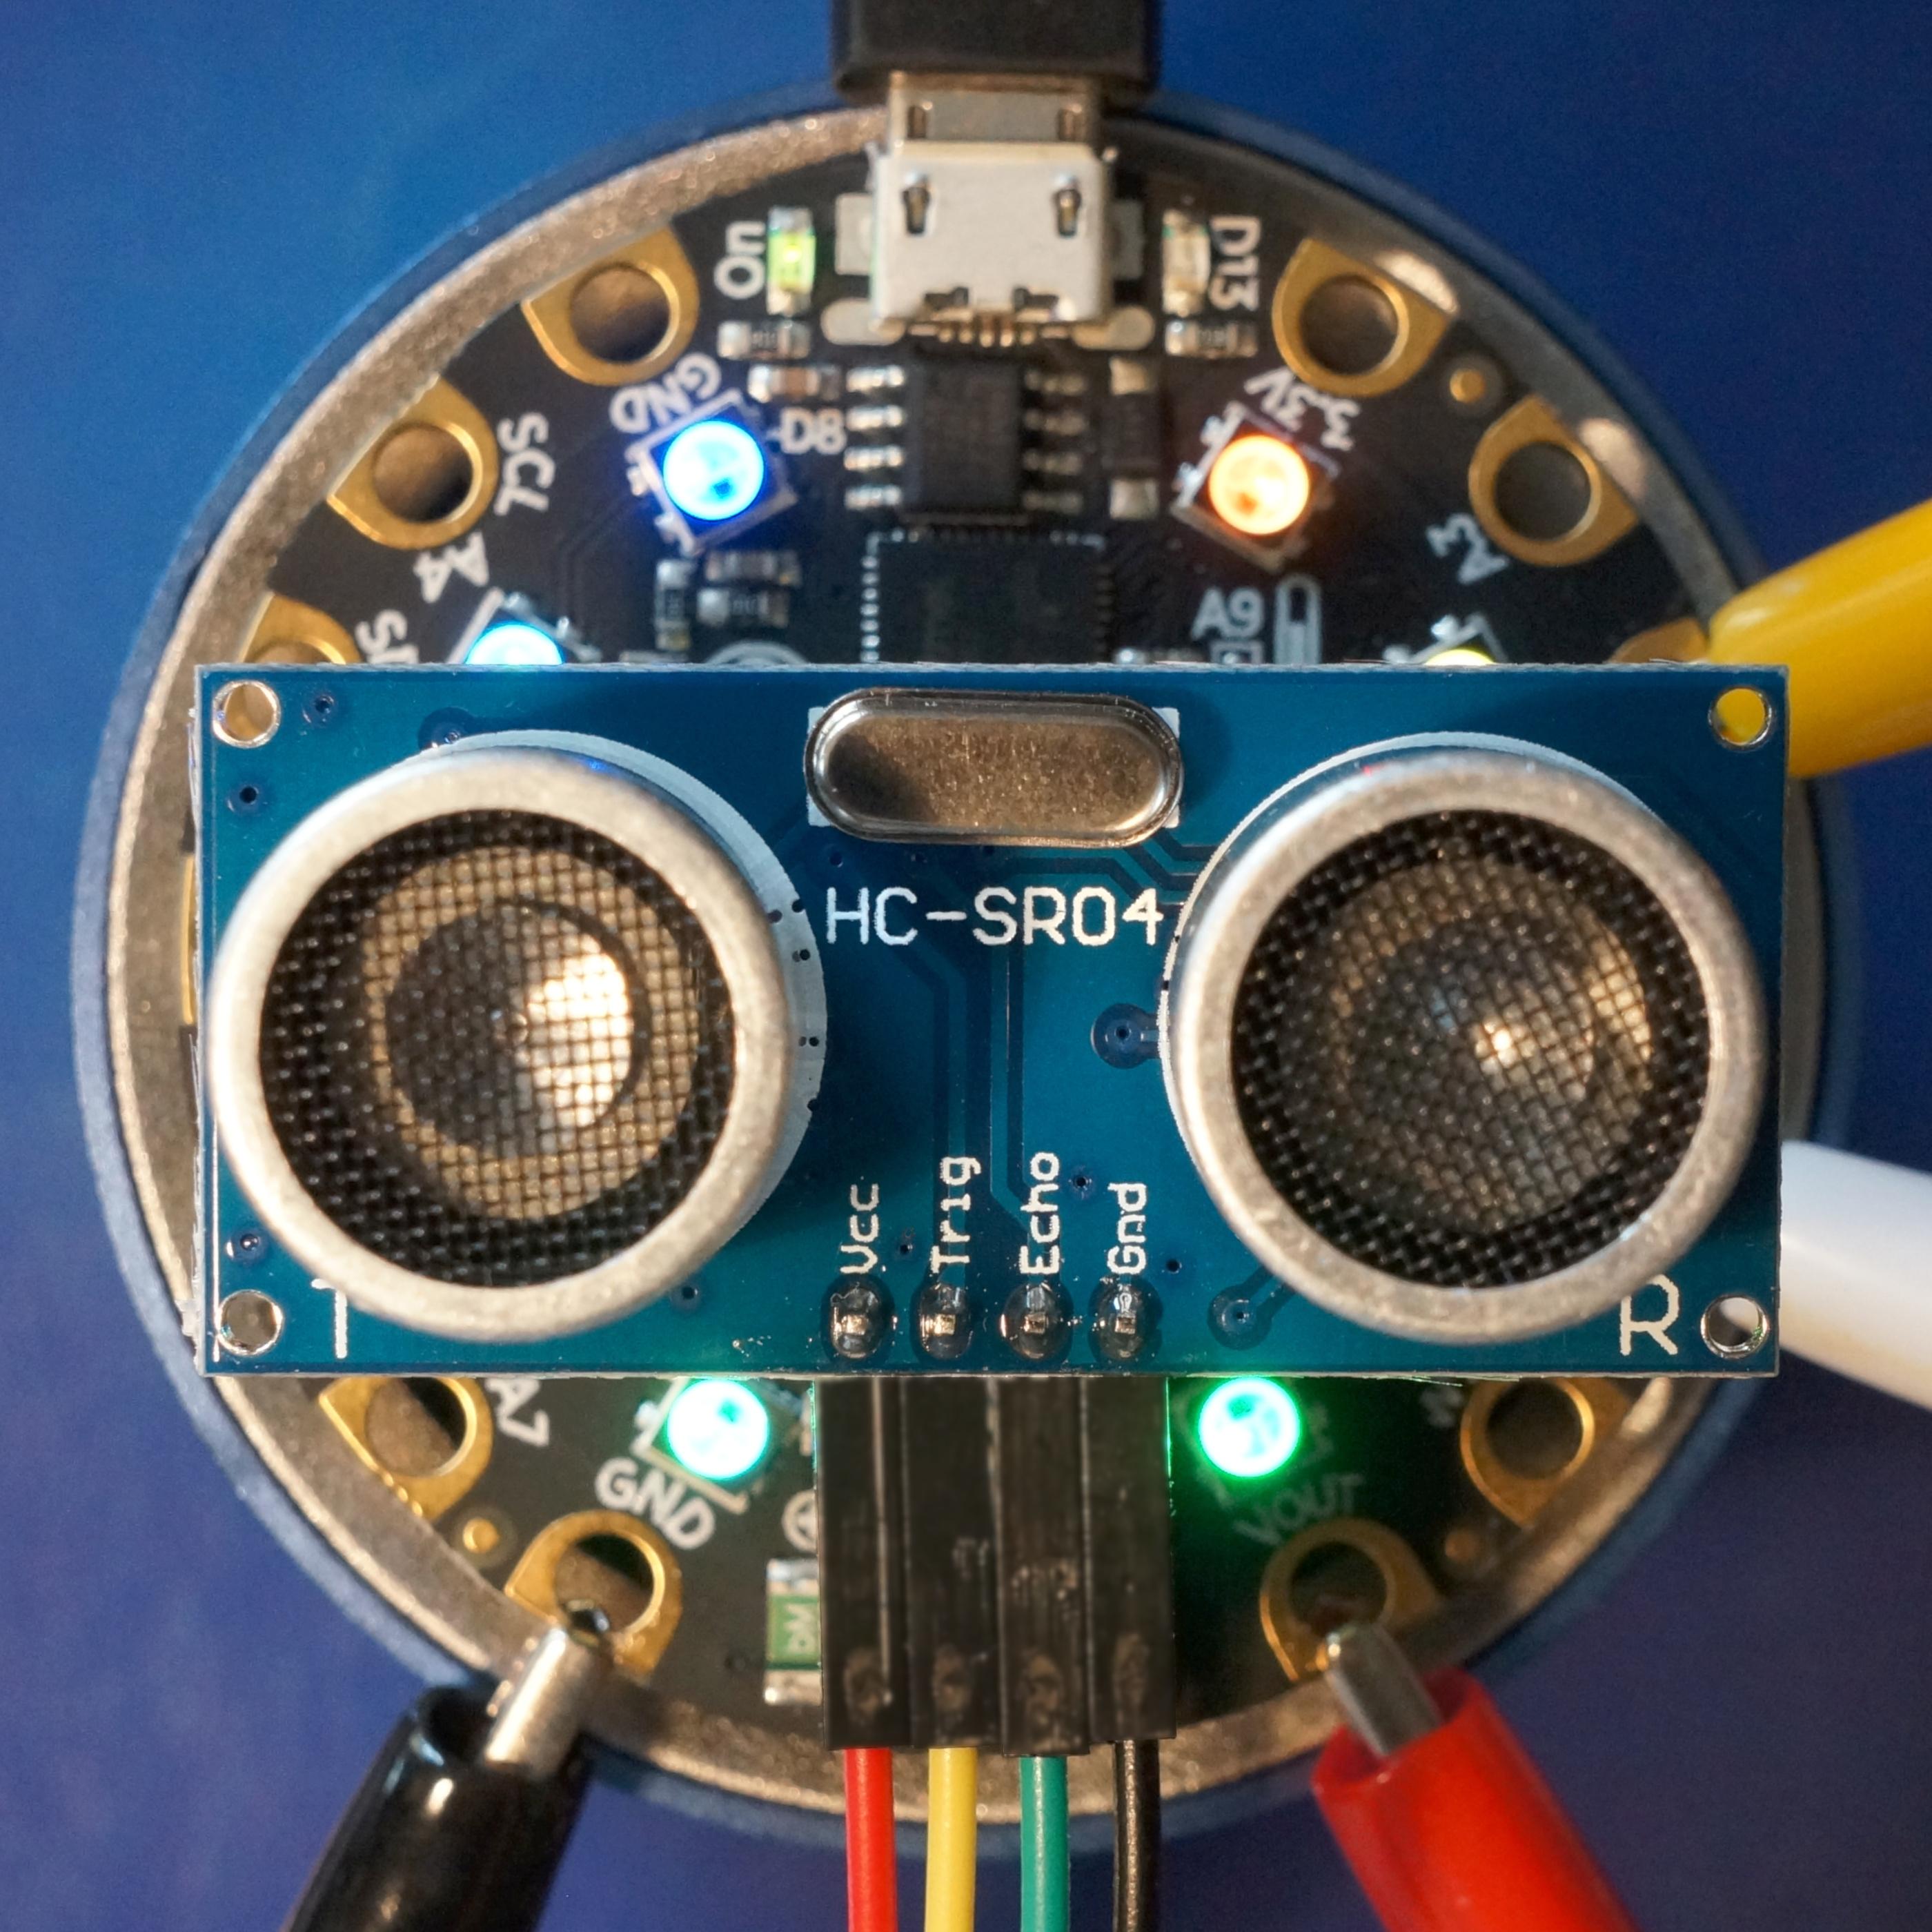 sensors_hcsr04-wired-over-cpx-2800.jpg